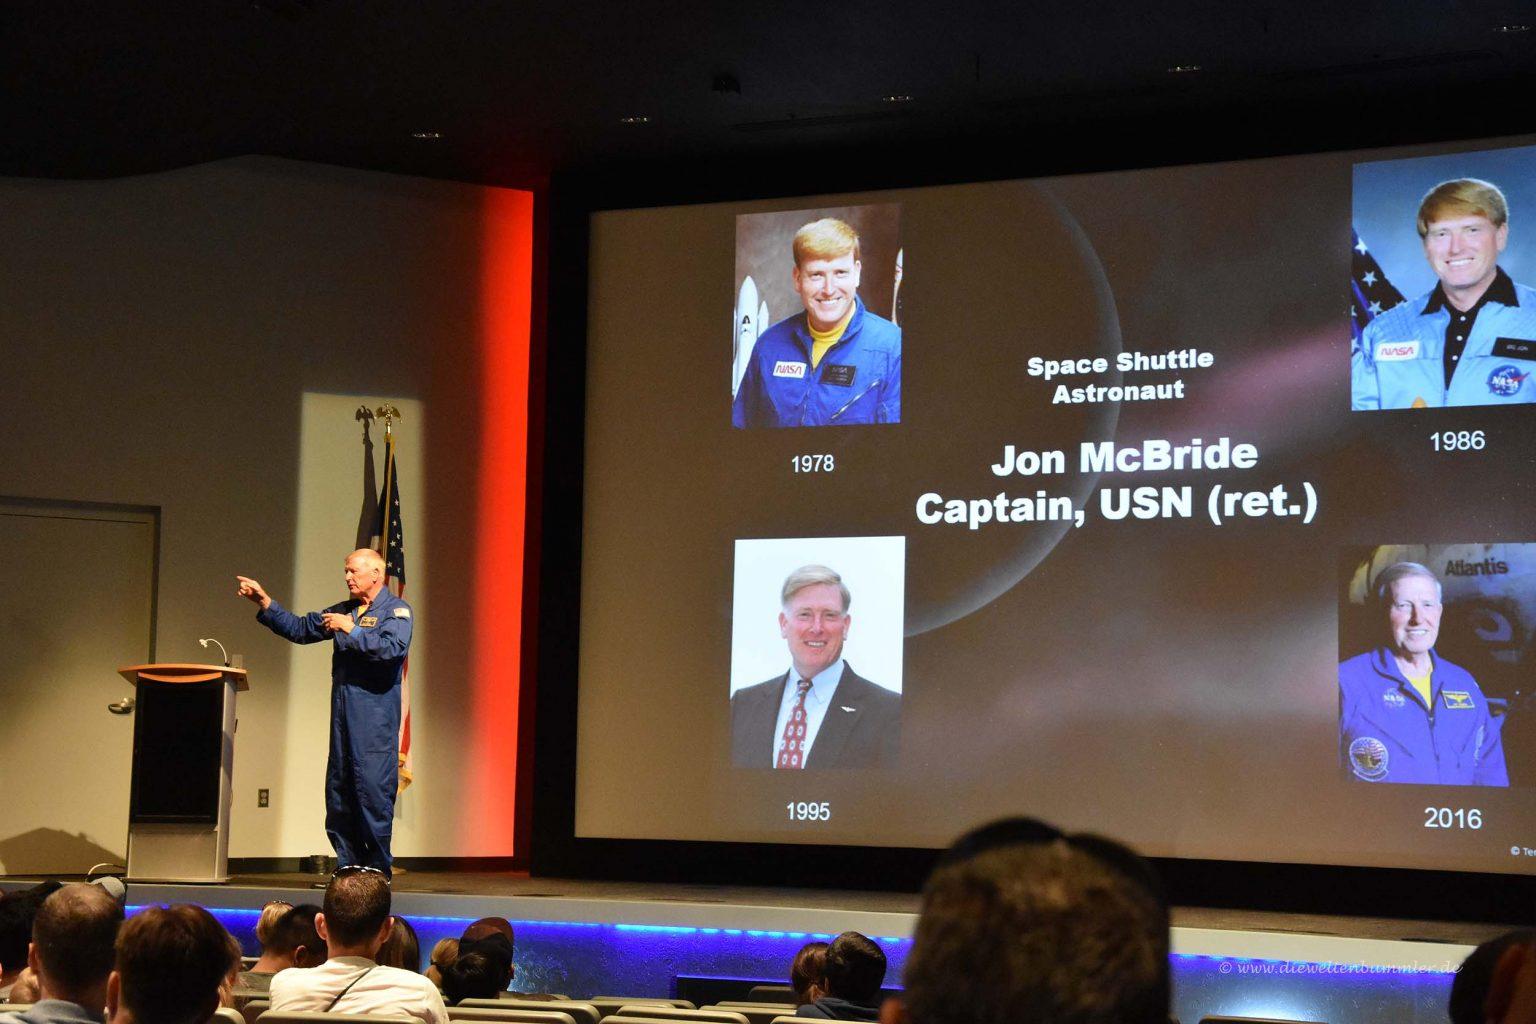 Astronaut Jon McBride